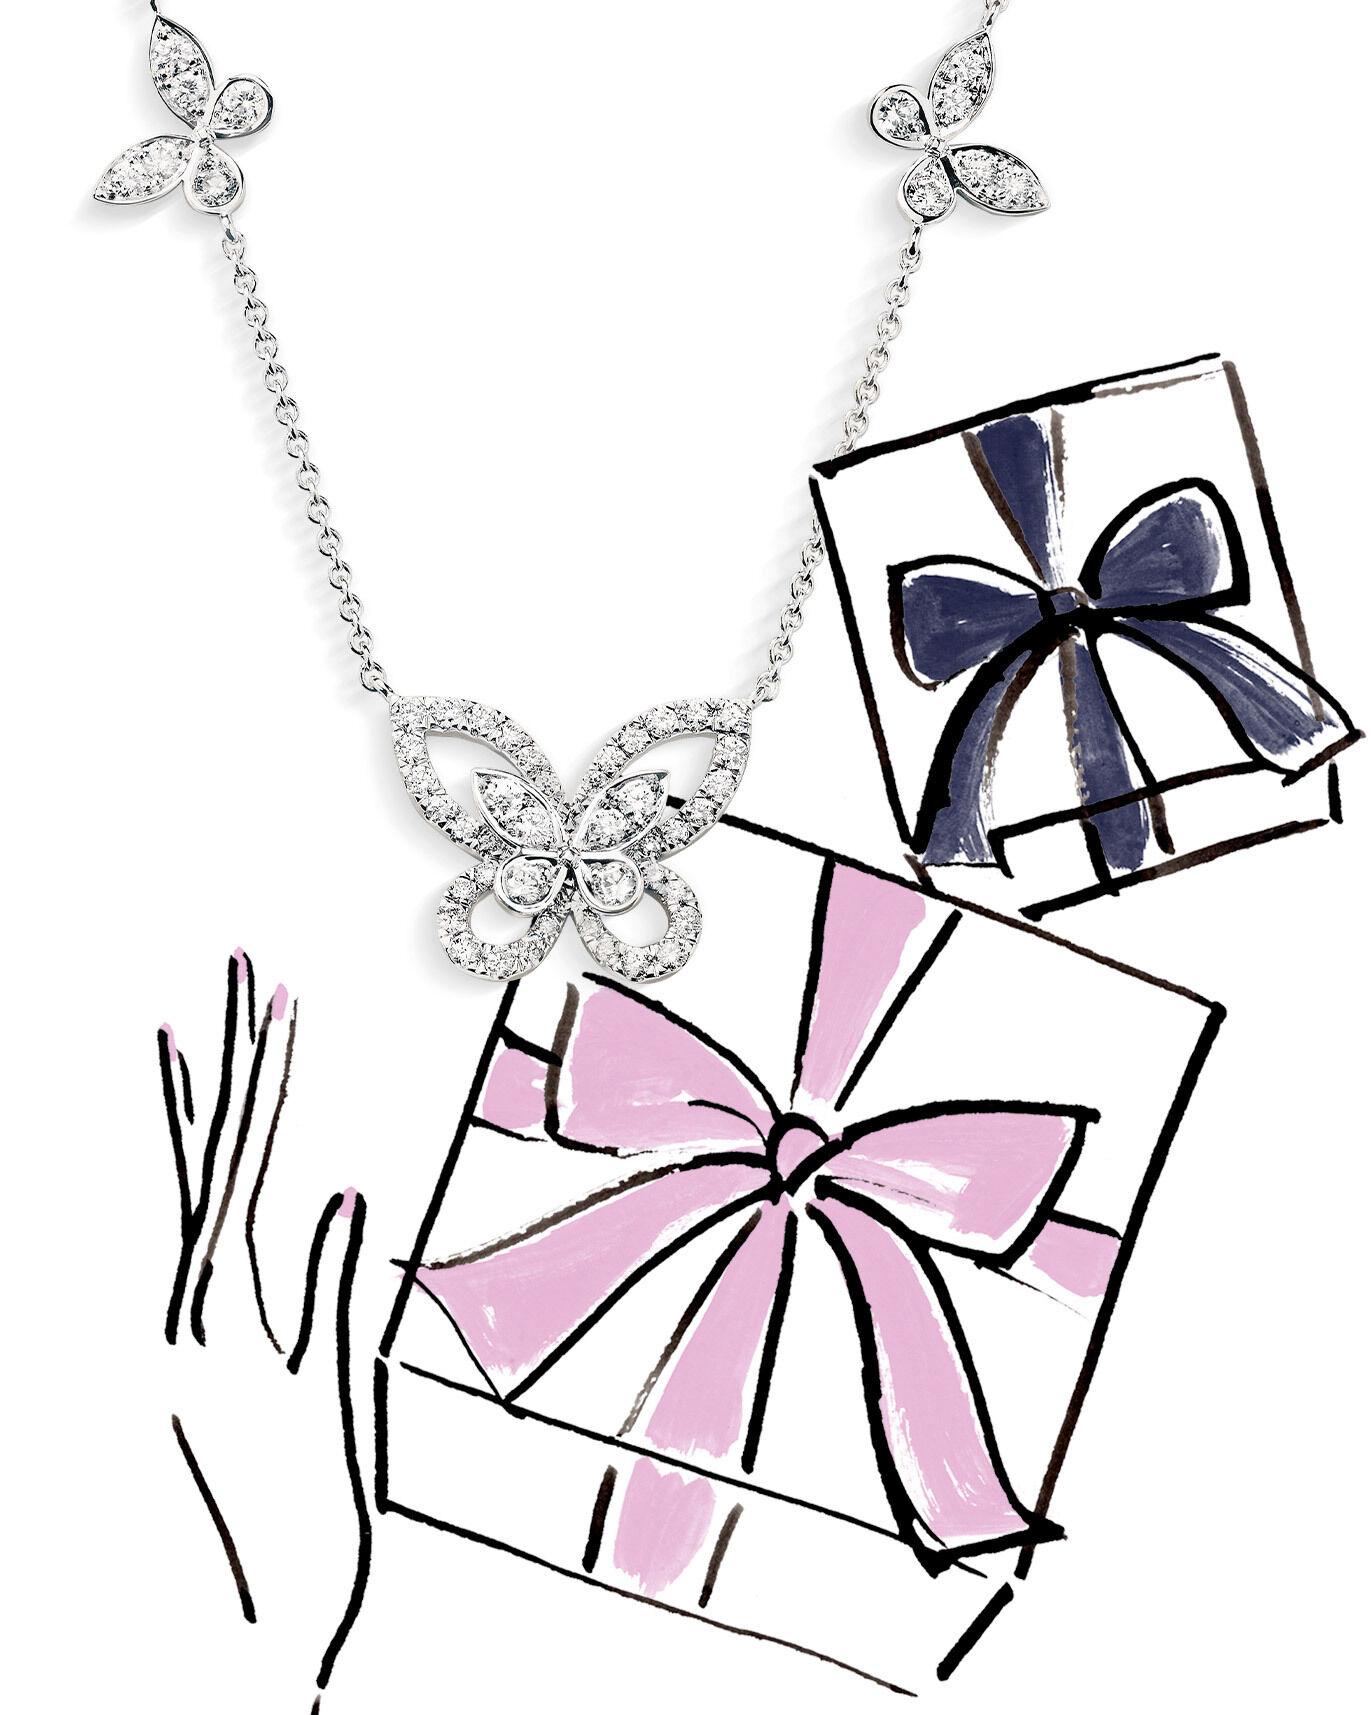 Model wears the Graff Threads collection diamond jewellery